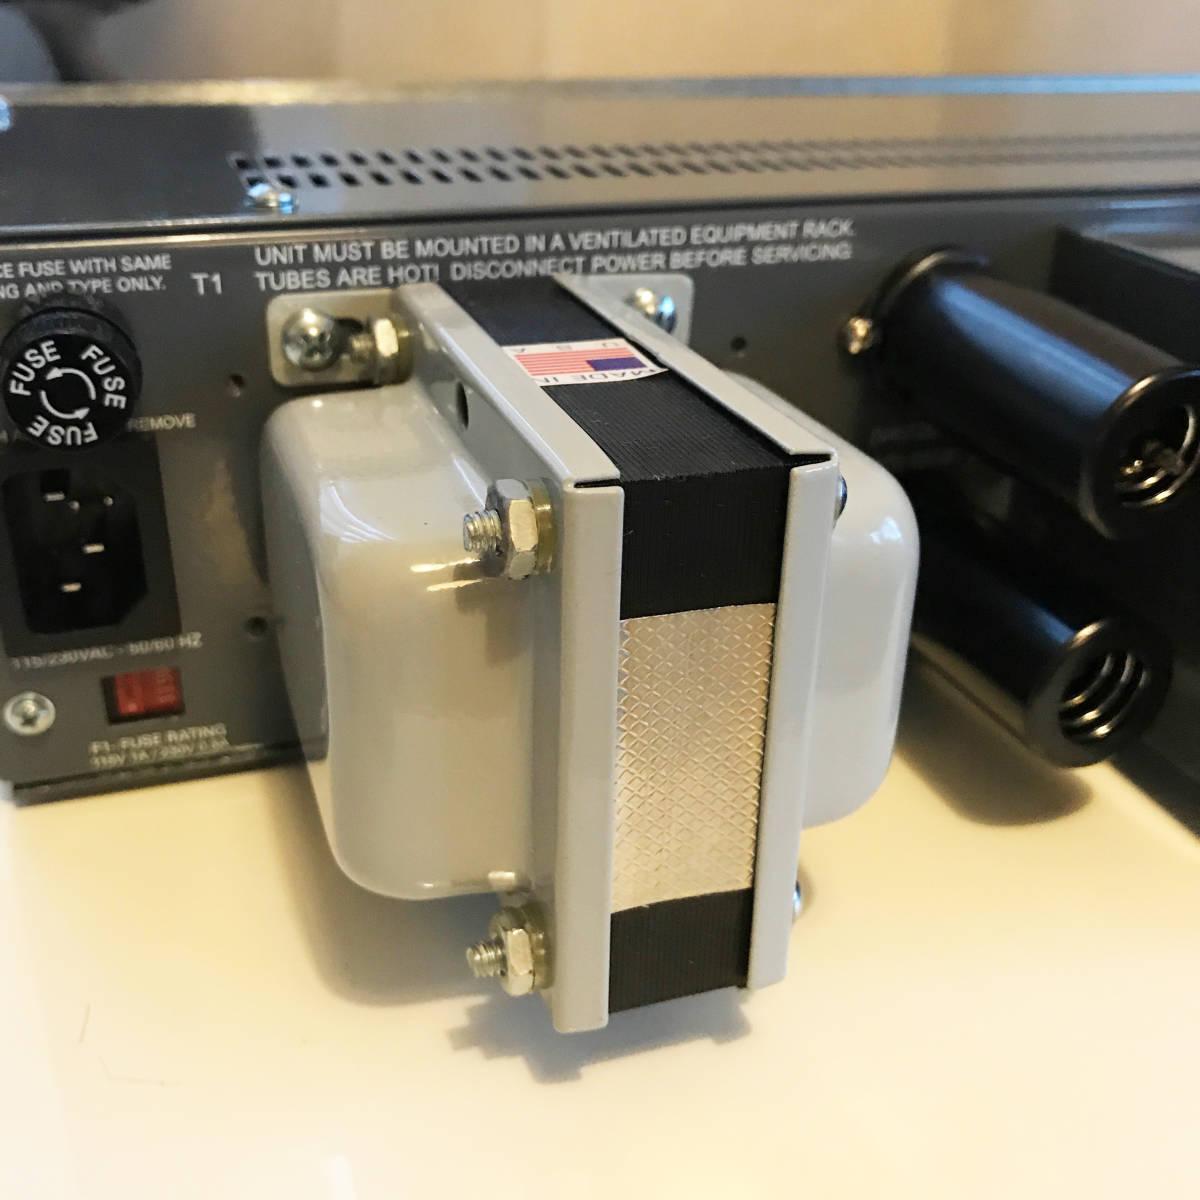 Retro Instruments Powerstrip(並行輸入品)_画像7